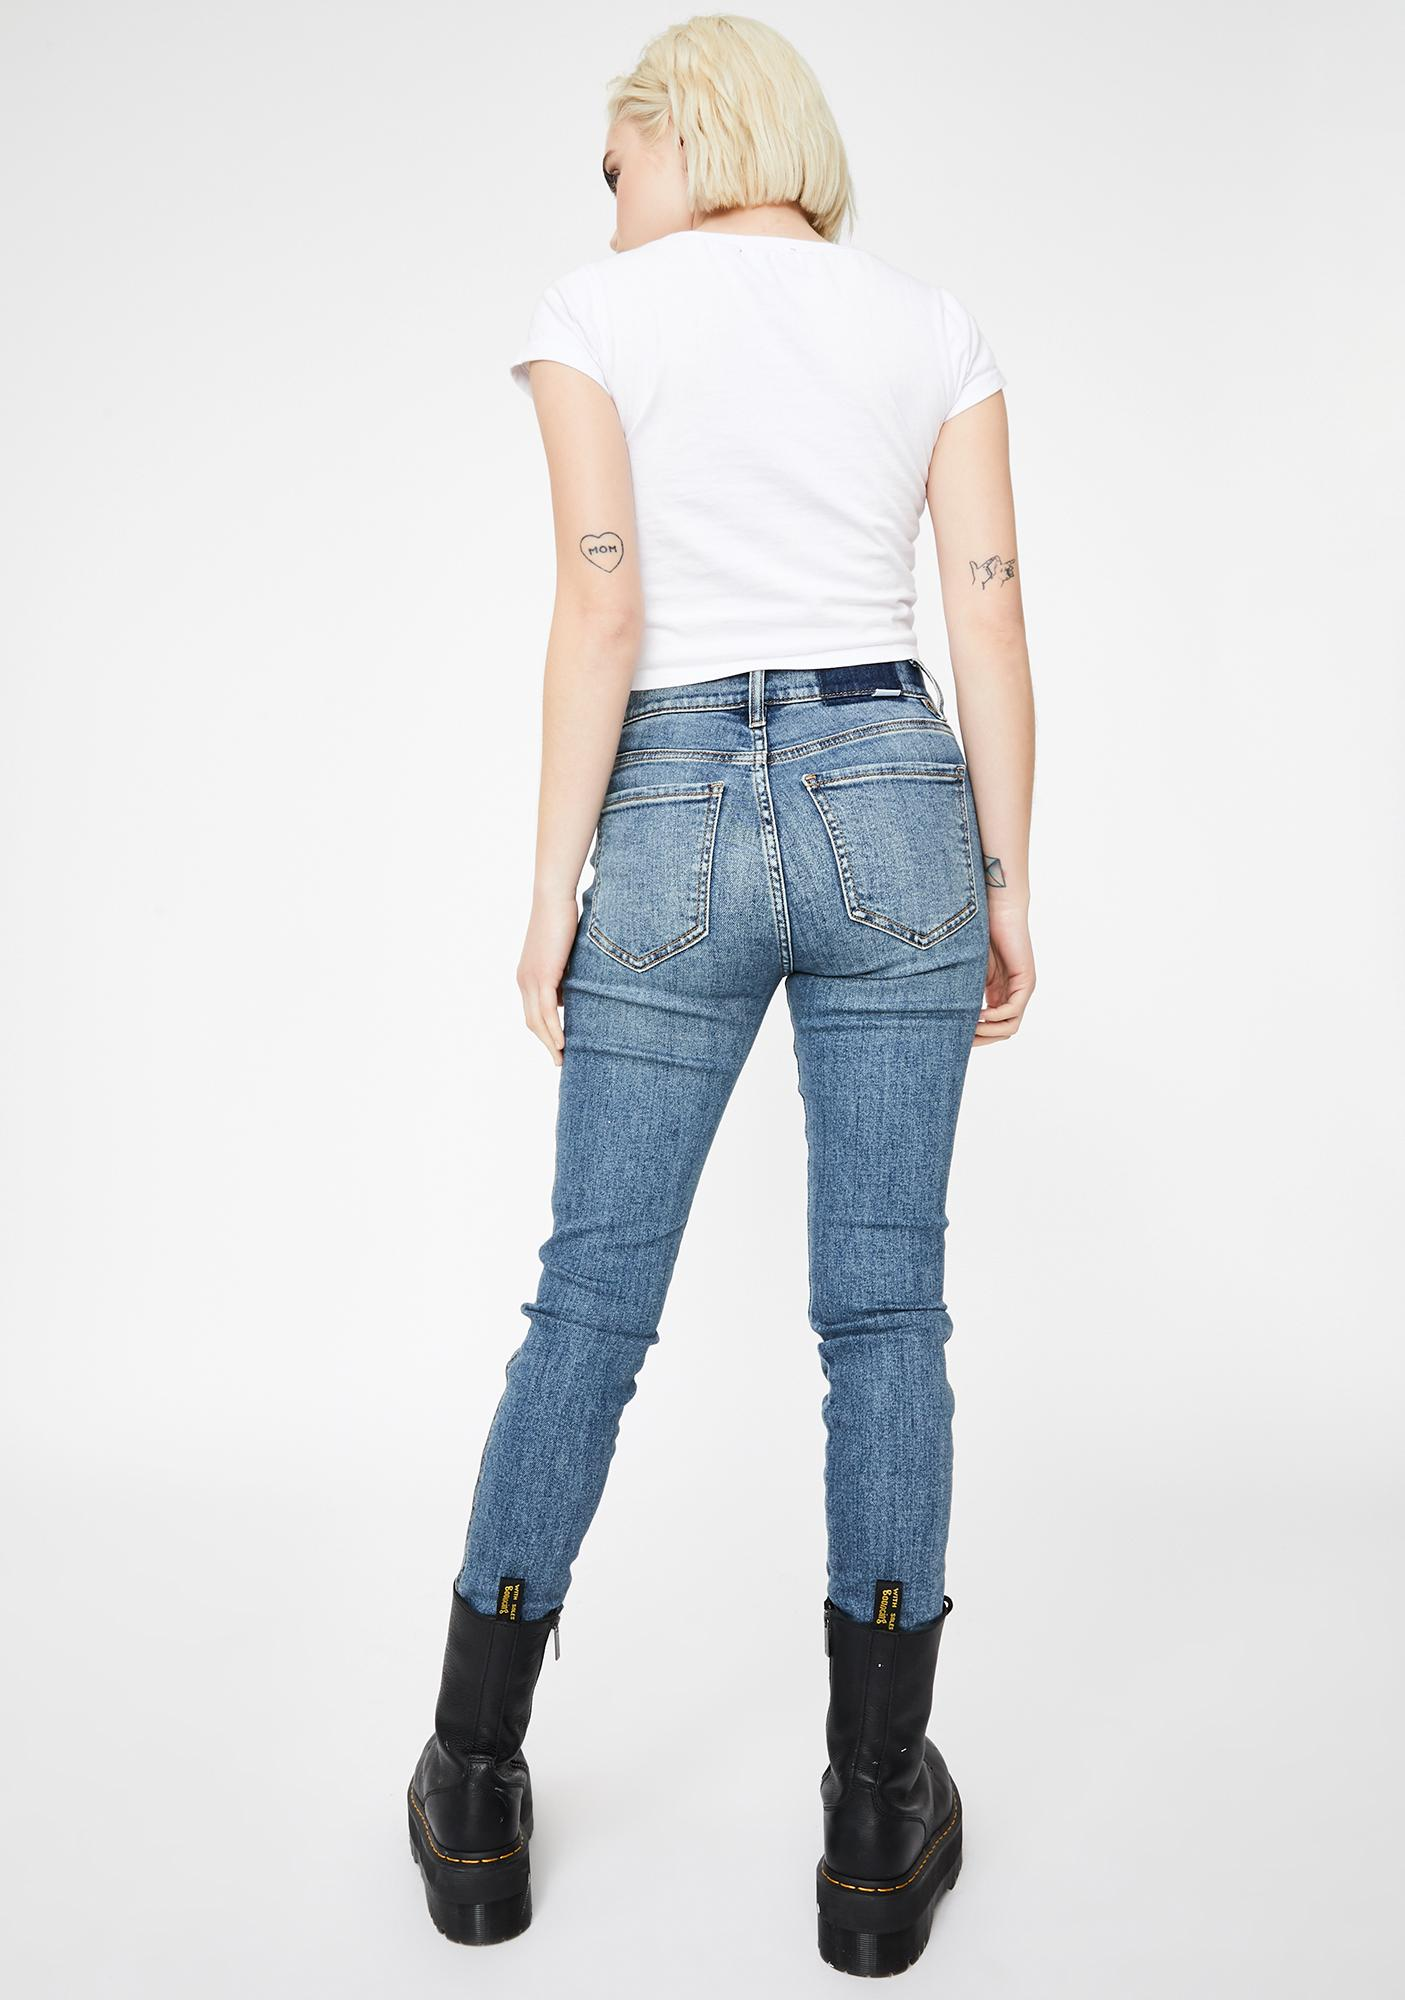 Daze Money Maker Skinny Jeans